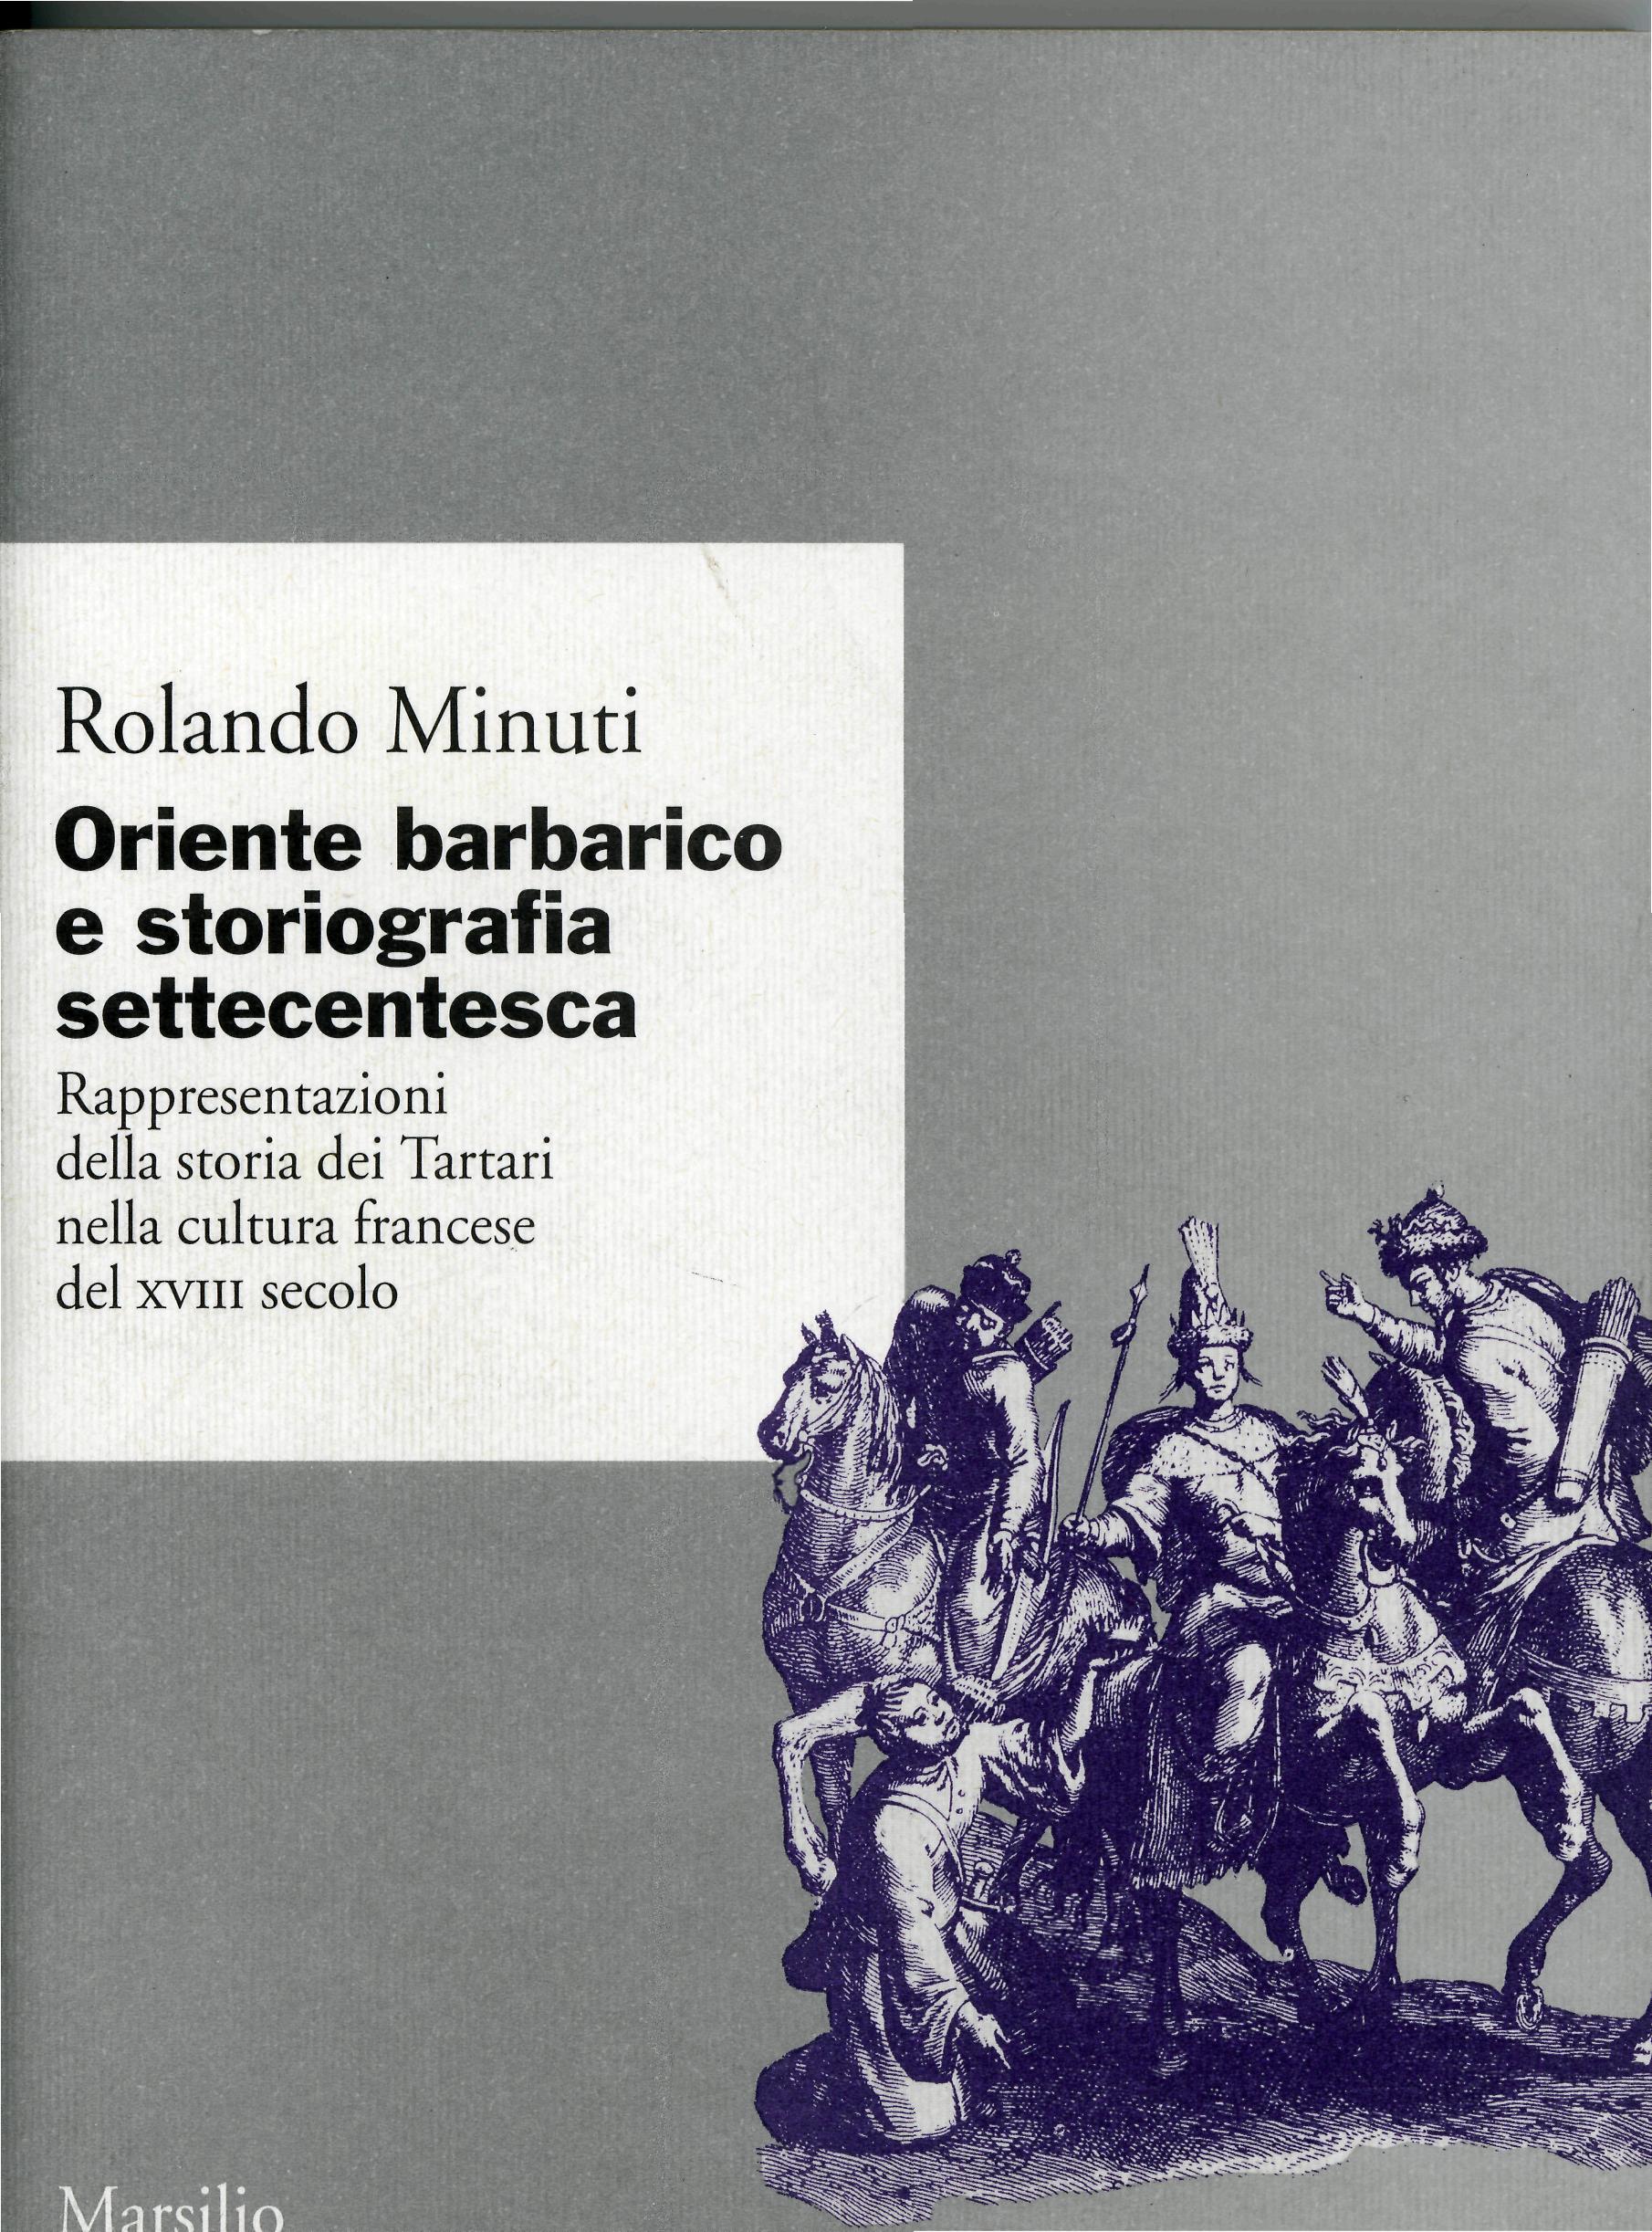 Oriente barbarico e storiografia settecentesca